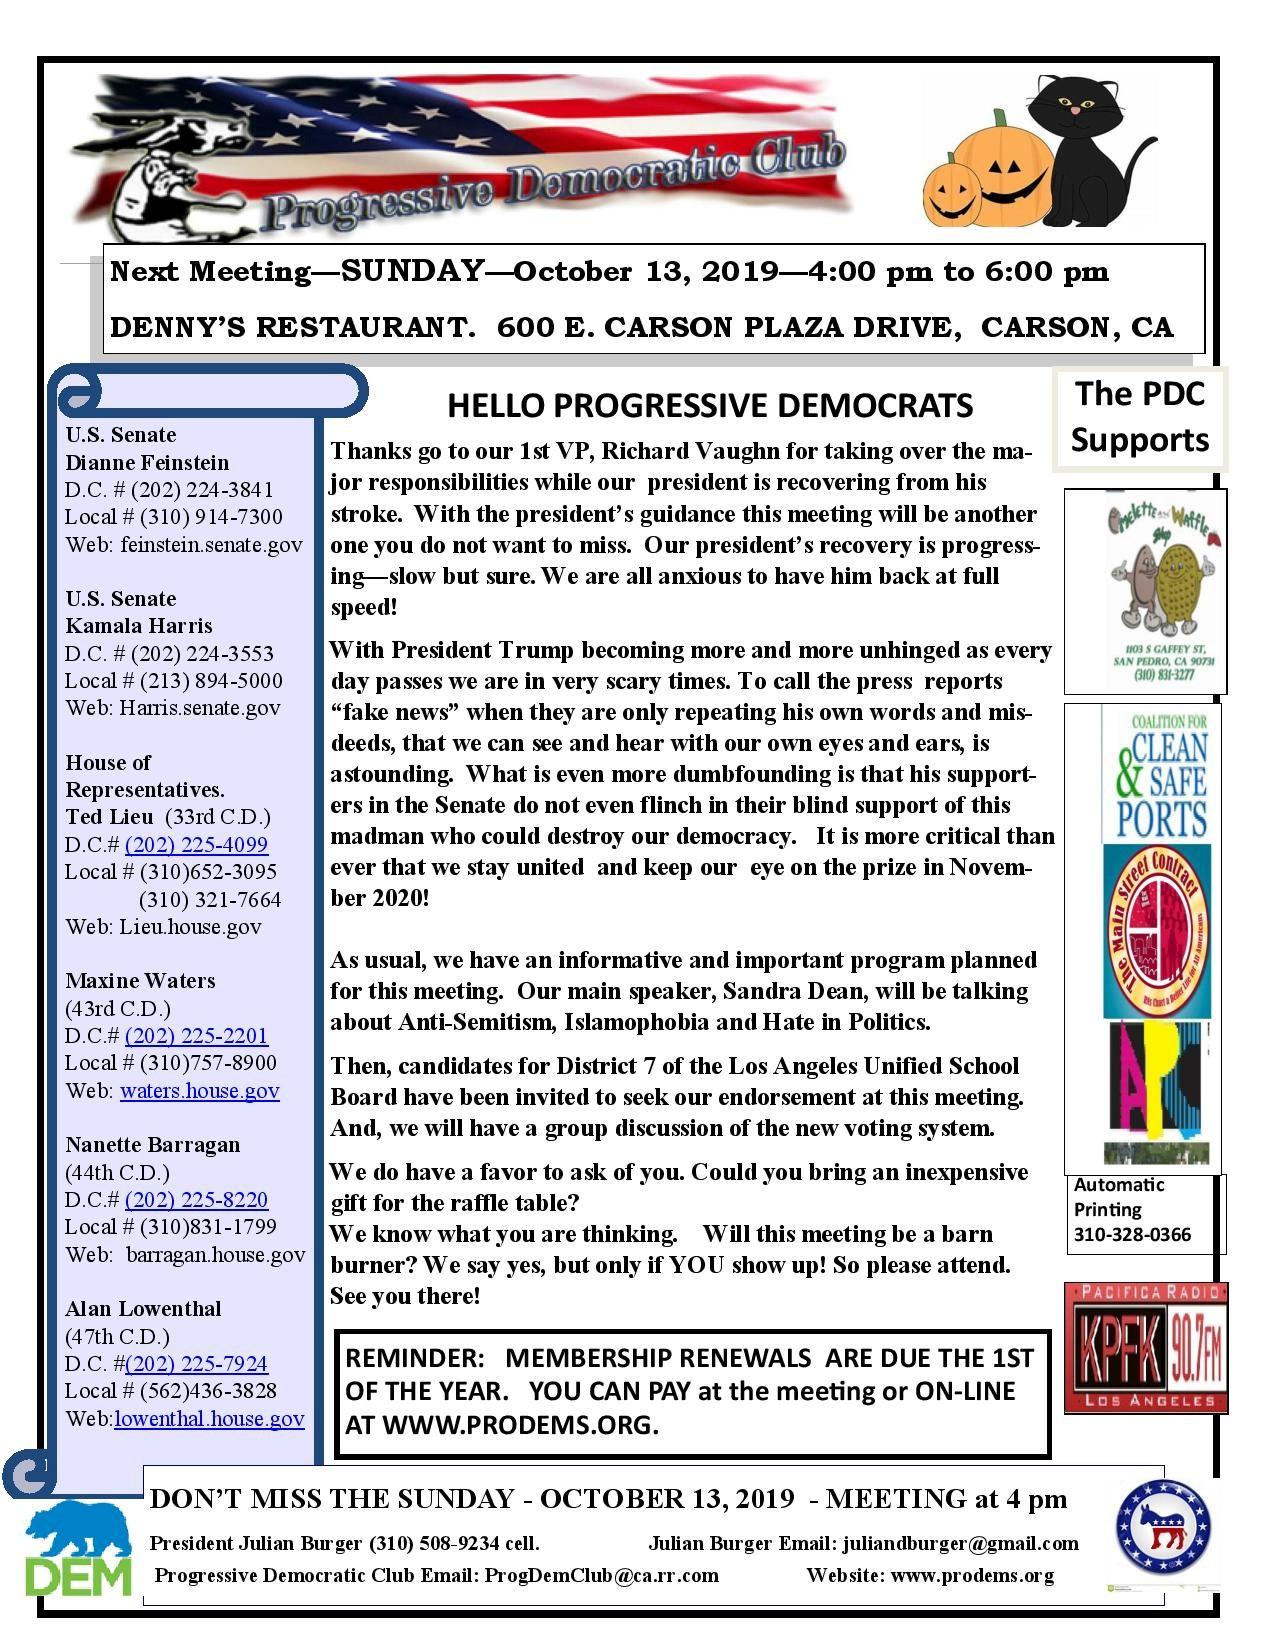 MeetingNotice_October13_2019_(1)-page-001_(1).jpg